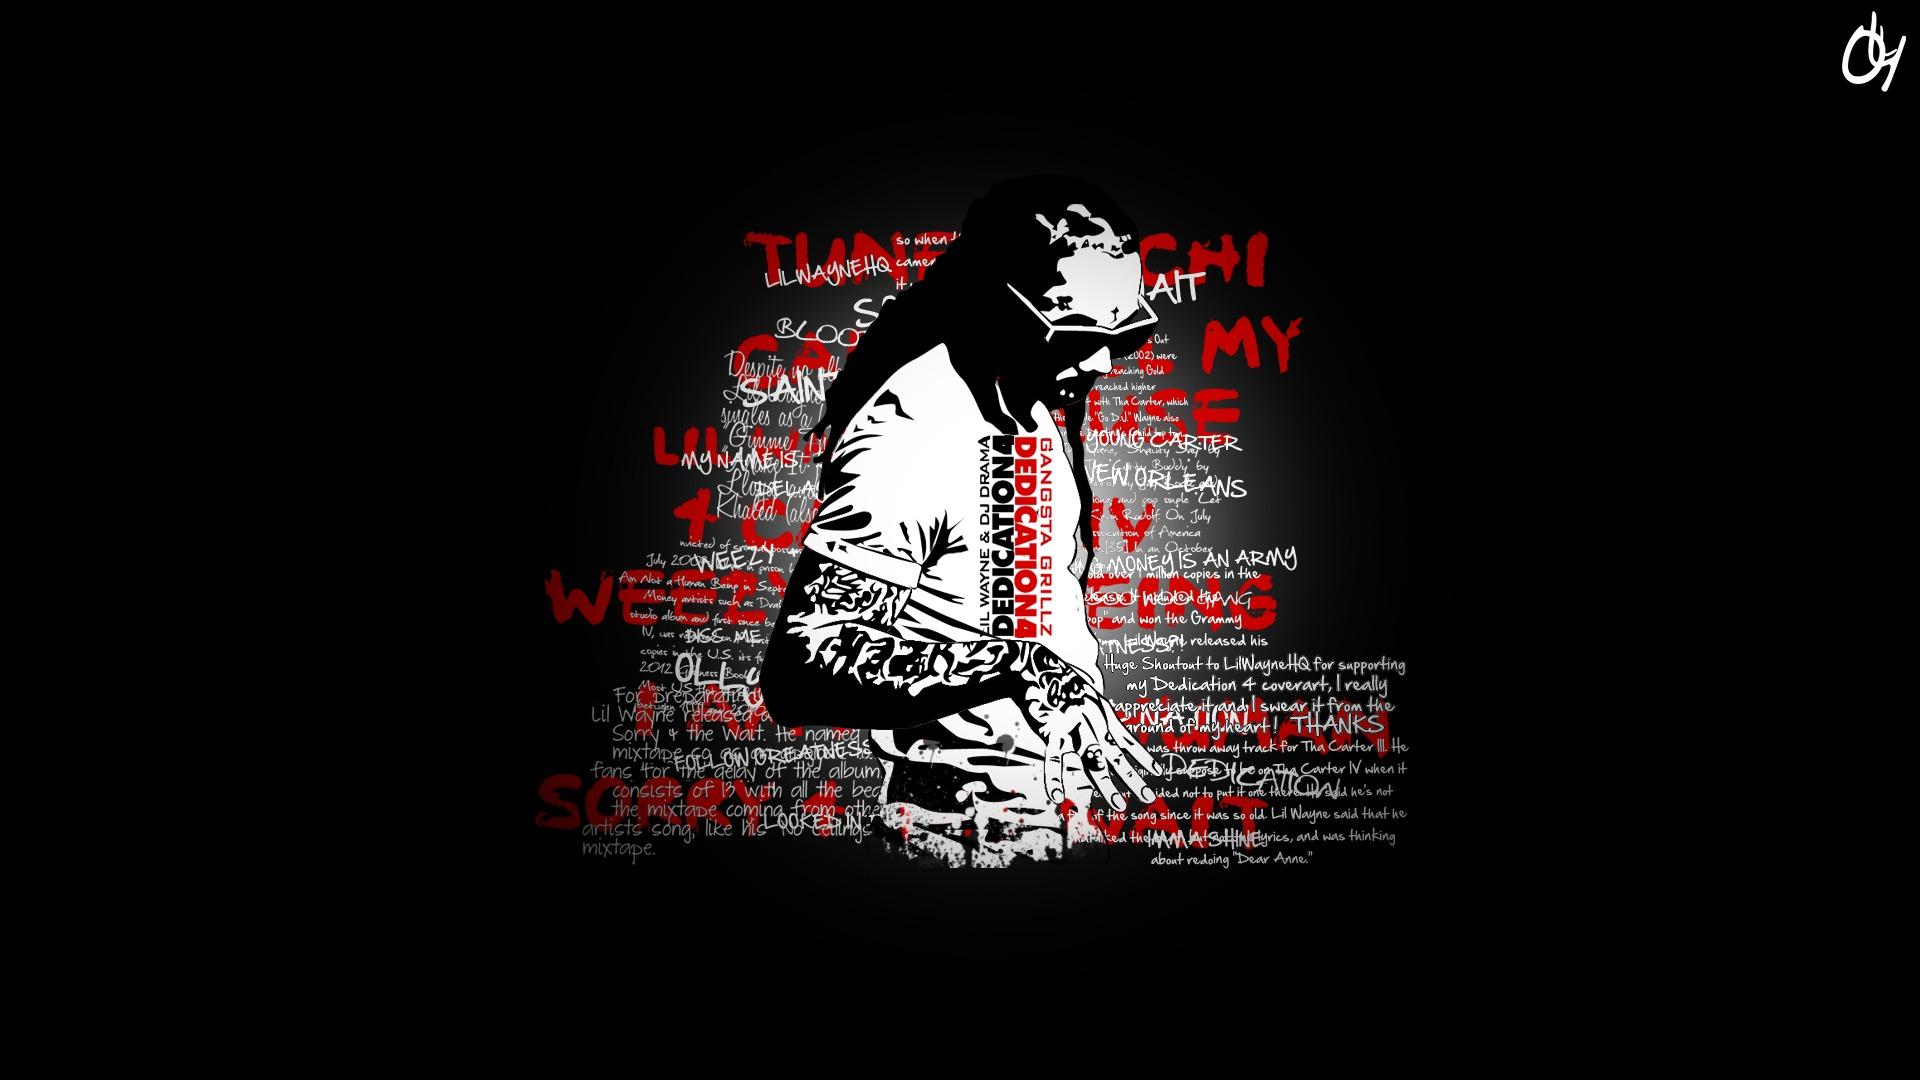 Inspirational Quotes Wallpaper Rapper Free Download Rap Wallpapers Pixelstalk Net